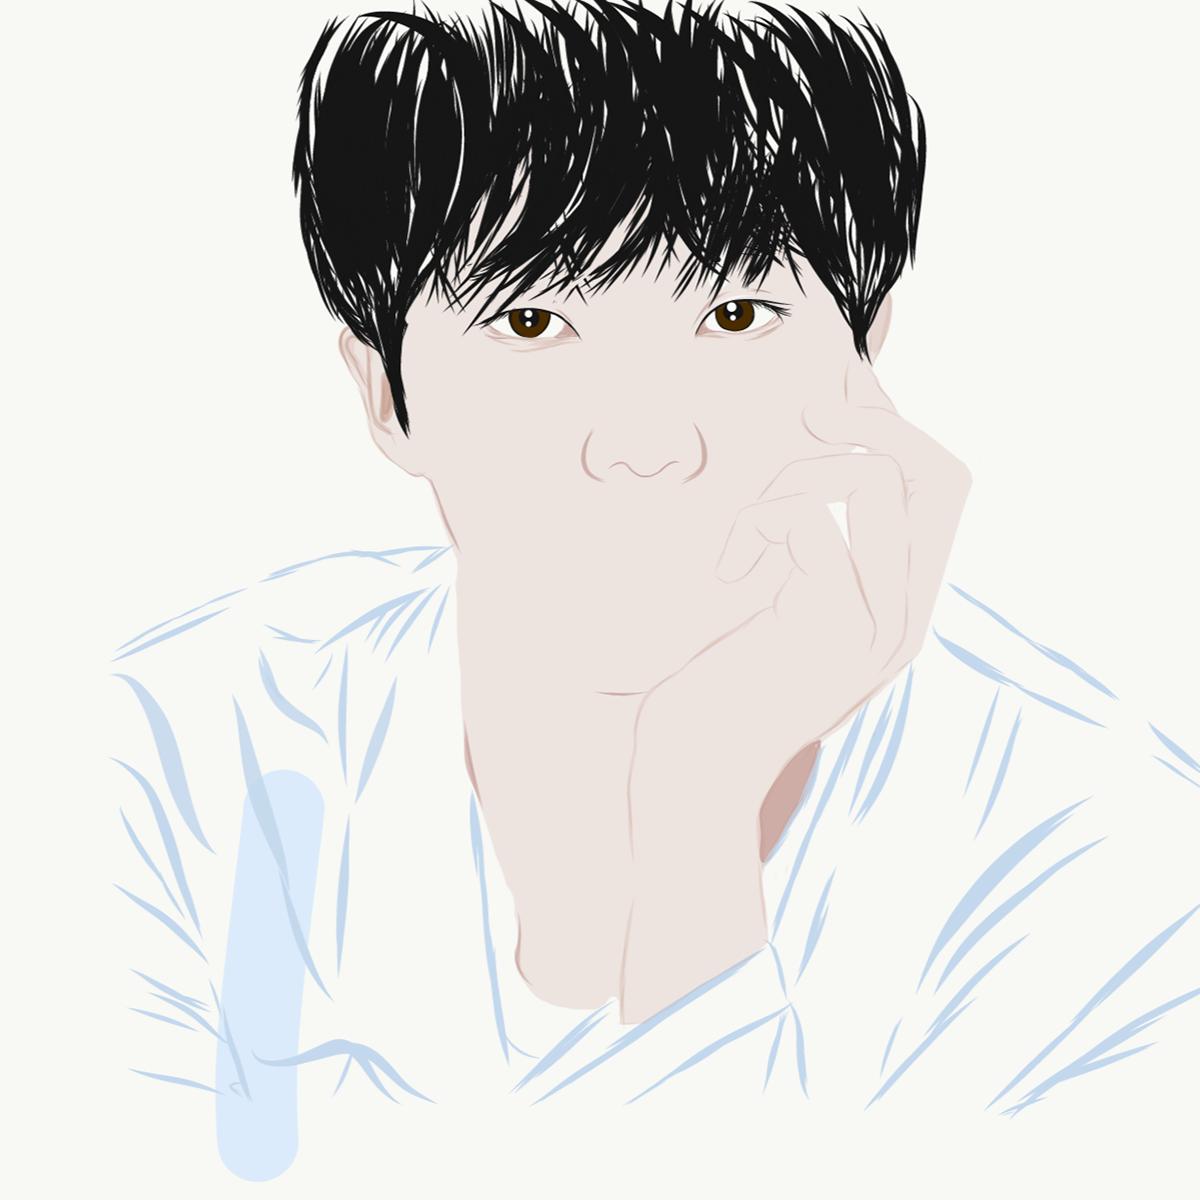 adobe draw,artworks,bts,btsfanart,Digital Art ,Digital Drawing,drawings,fanart,happy birthday jin,ILLUSTRATION ,Jin,kpop,seokjin